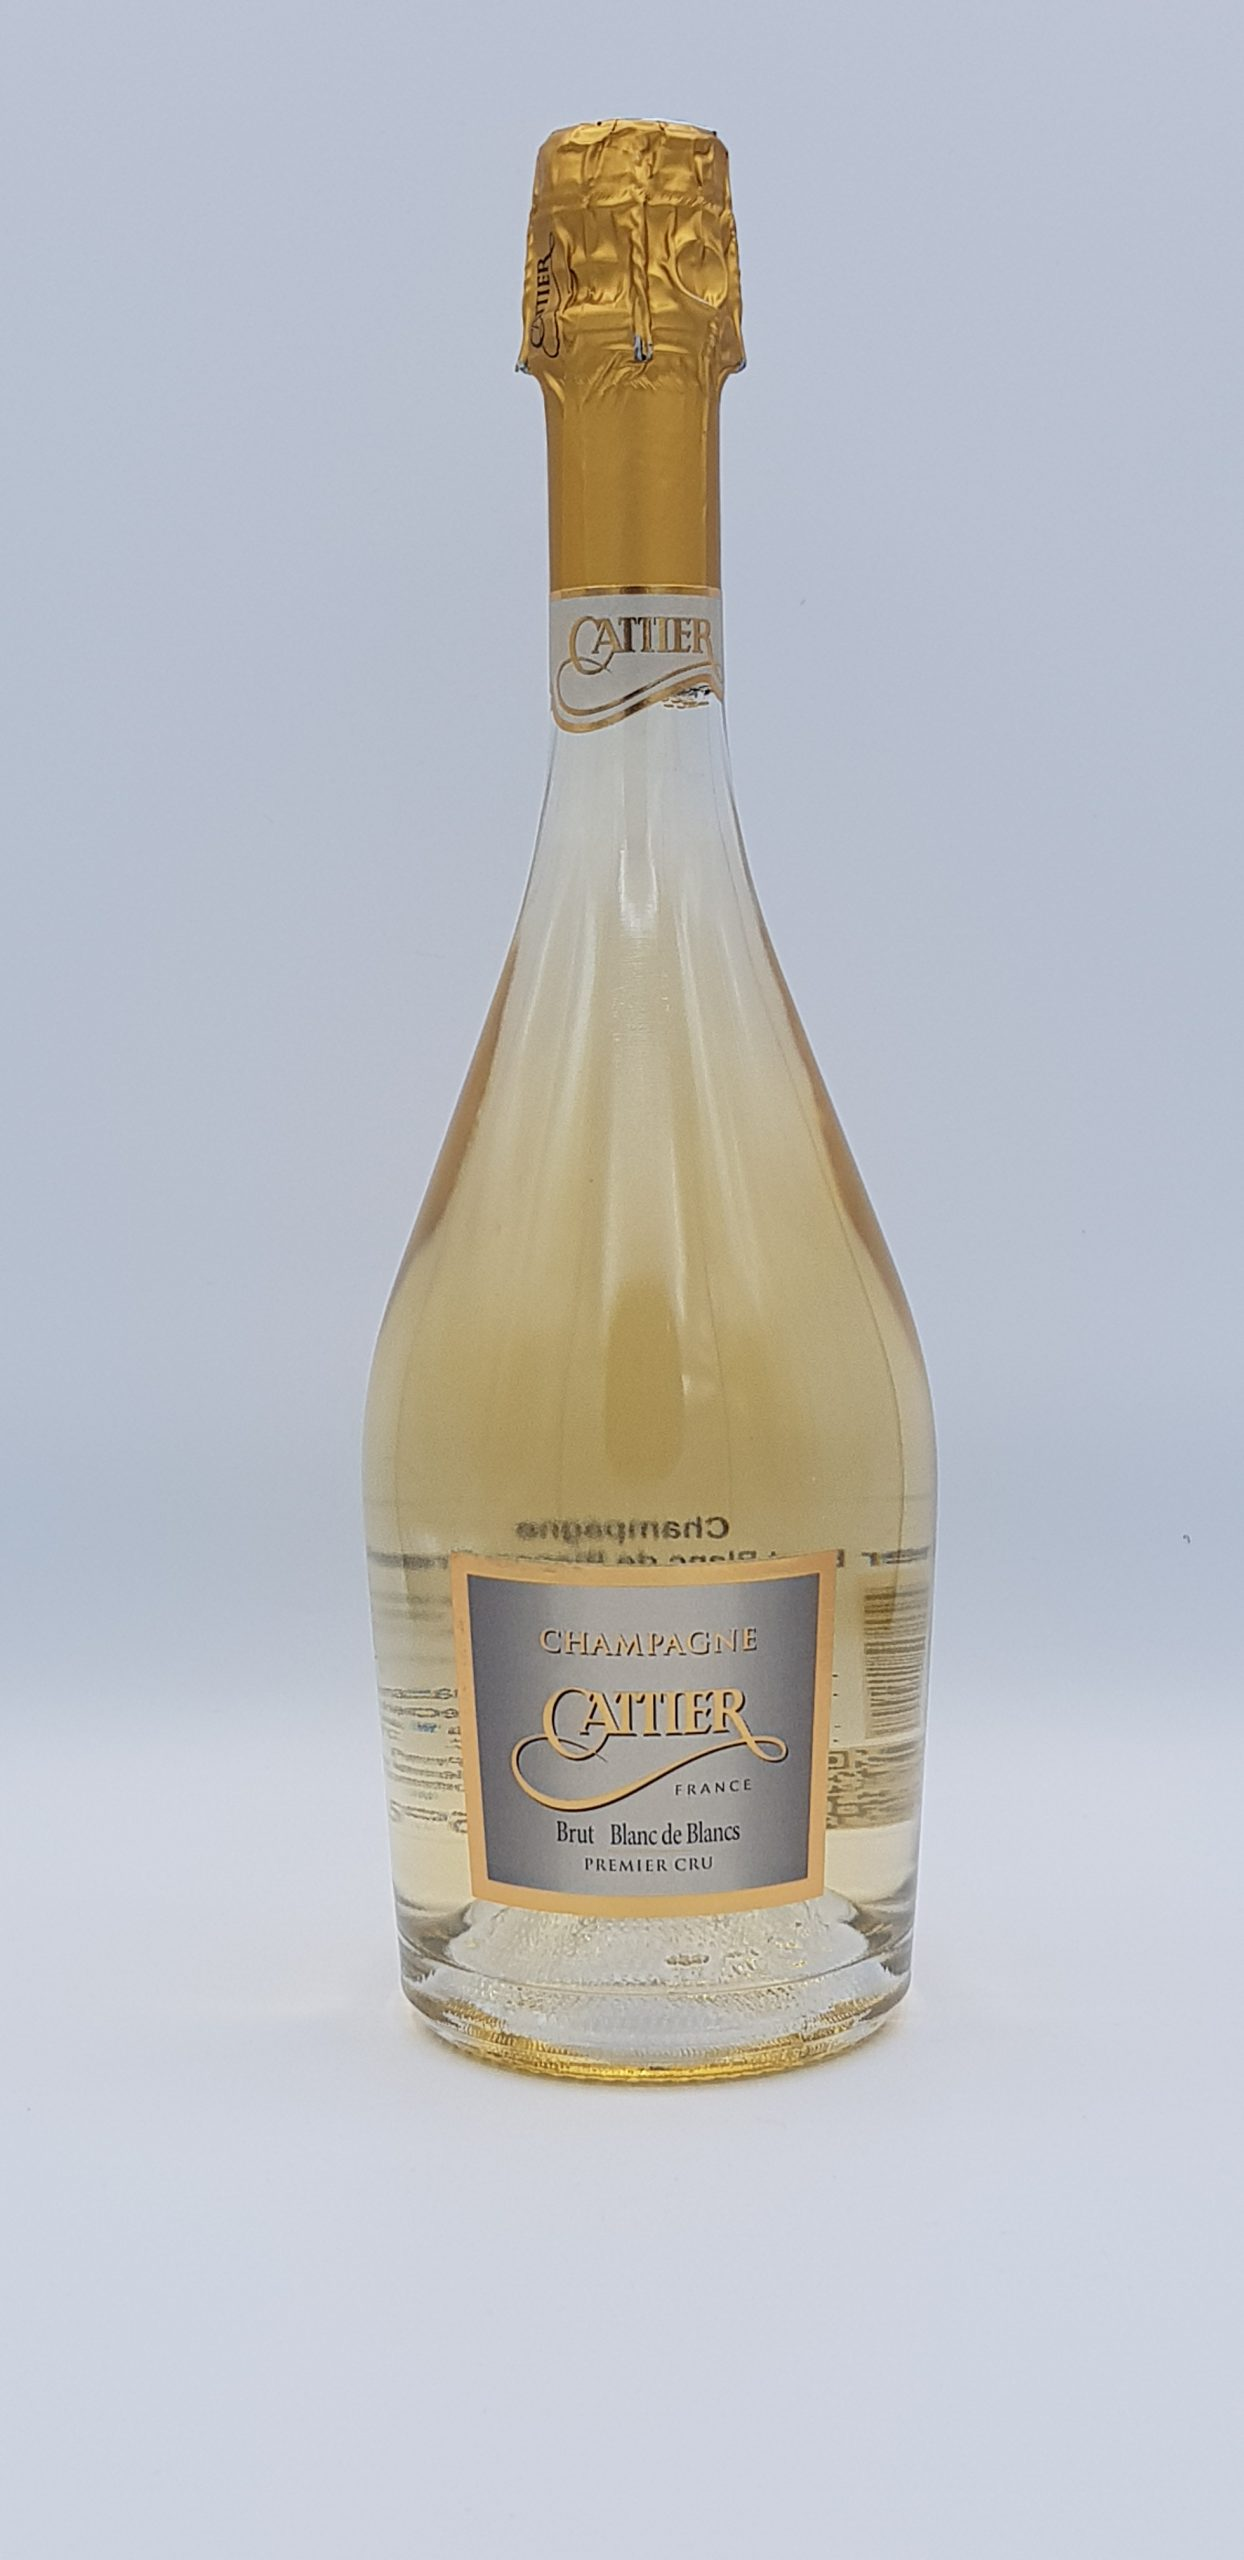 Champagne Cattier Brut Blanc De Blanc